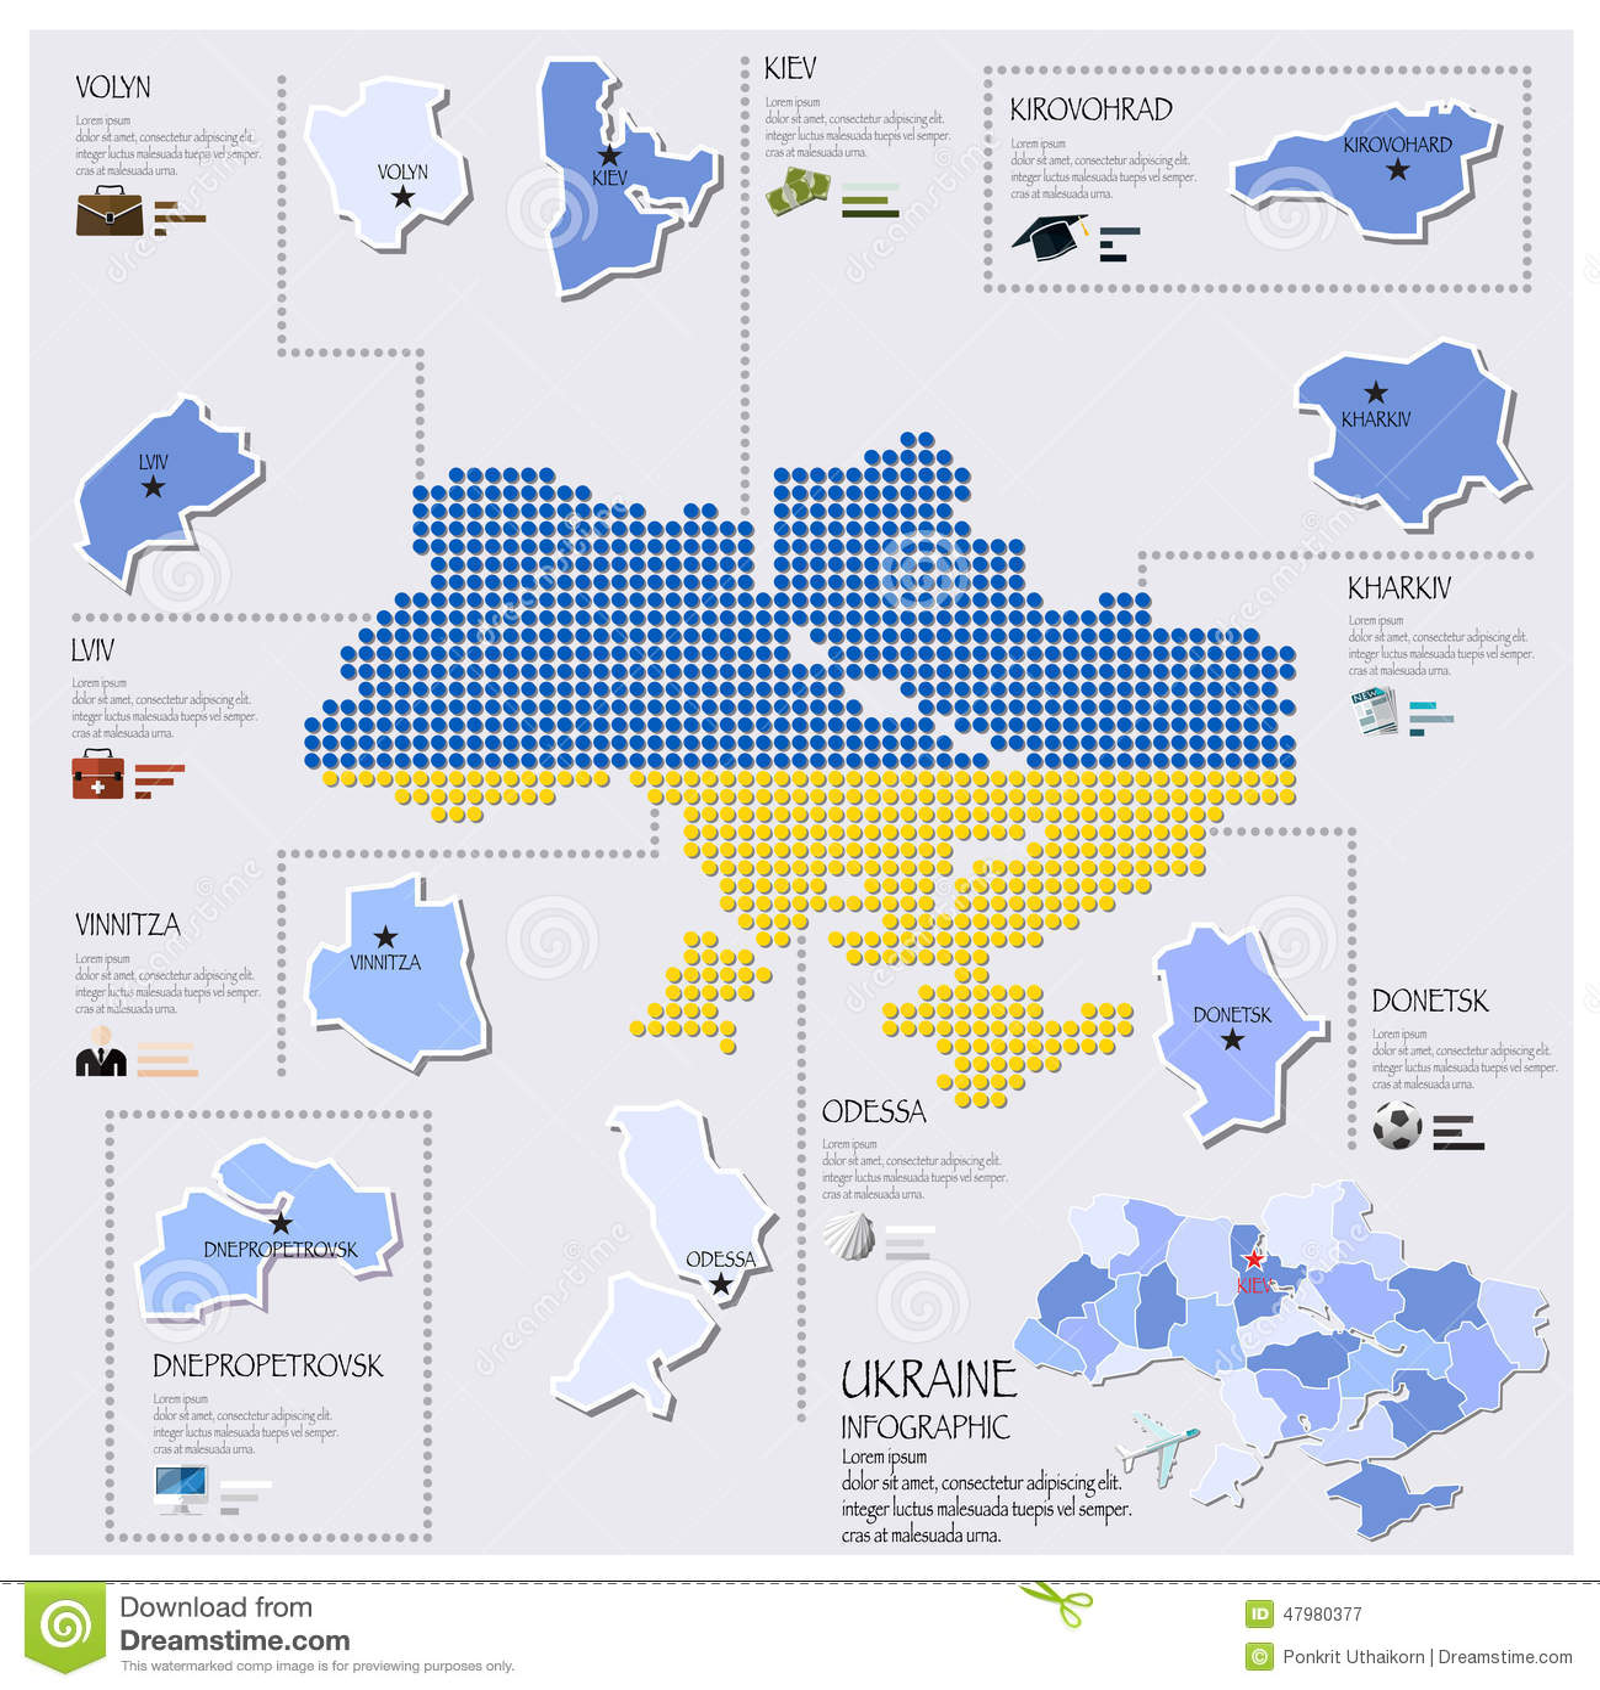 Dot and flag map of ukraine infographic design stock vector download comp toneelgroepblik Images